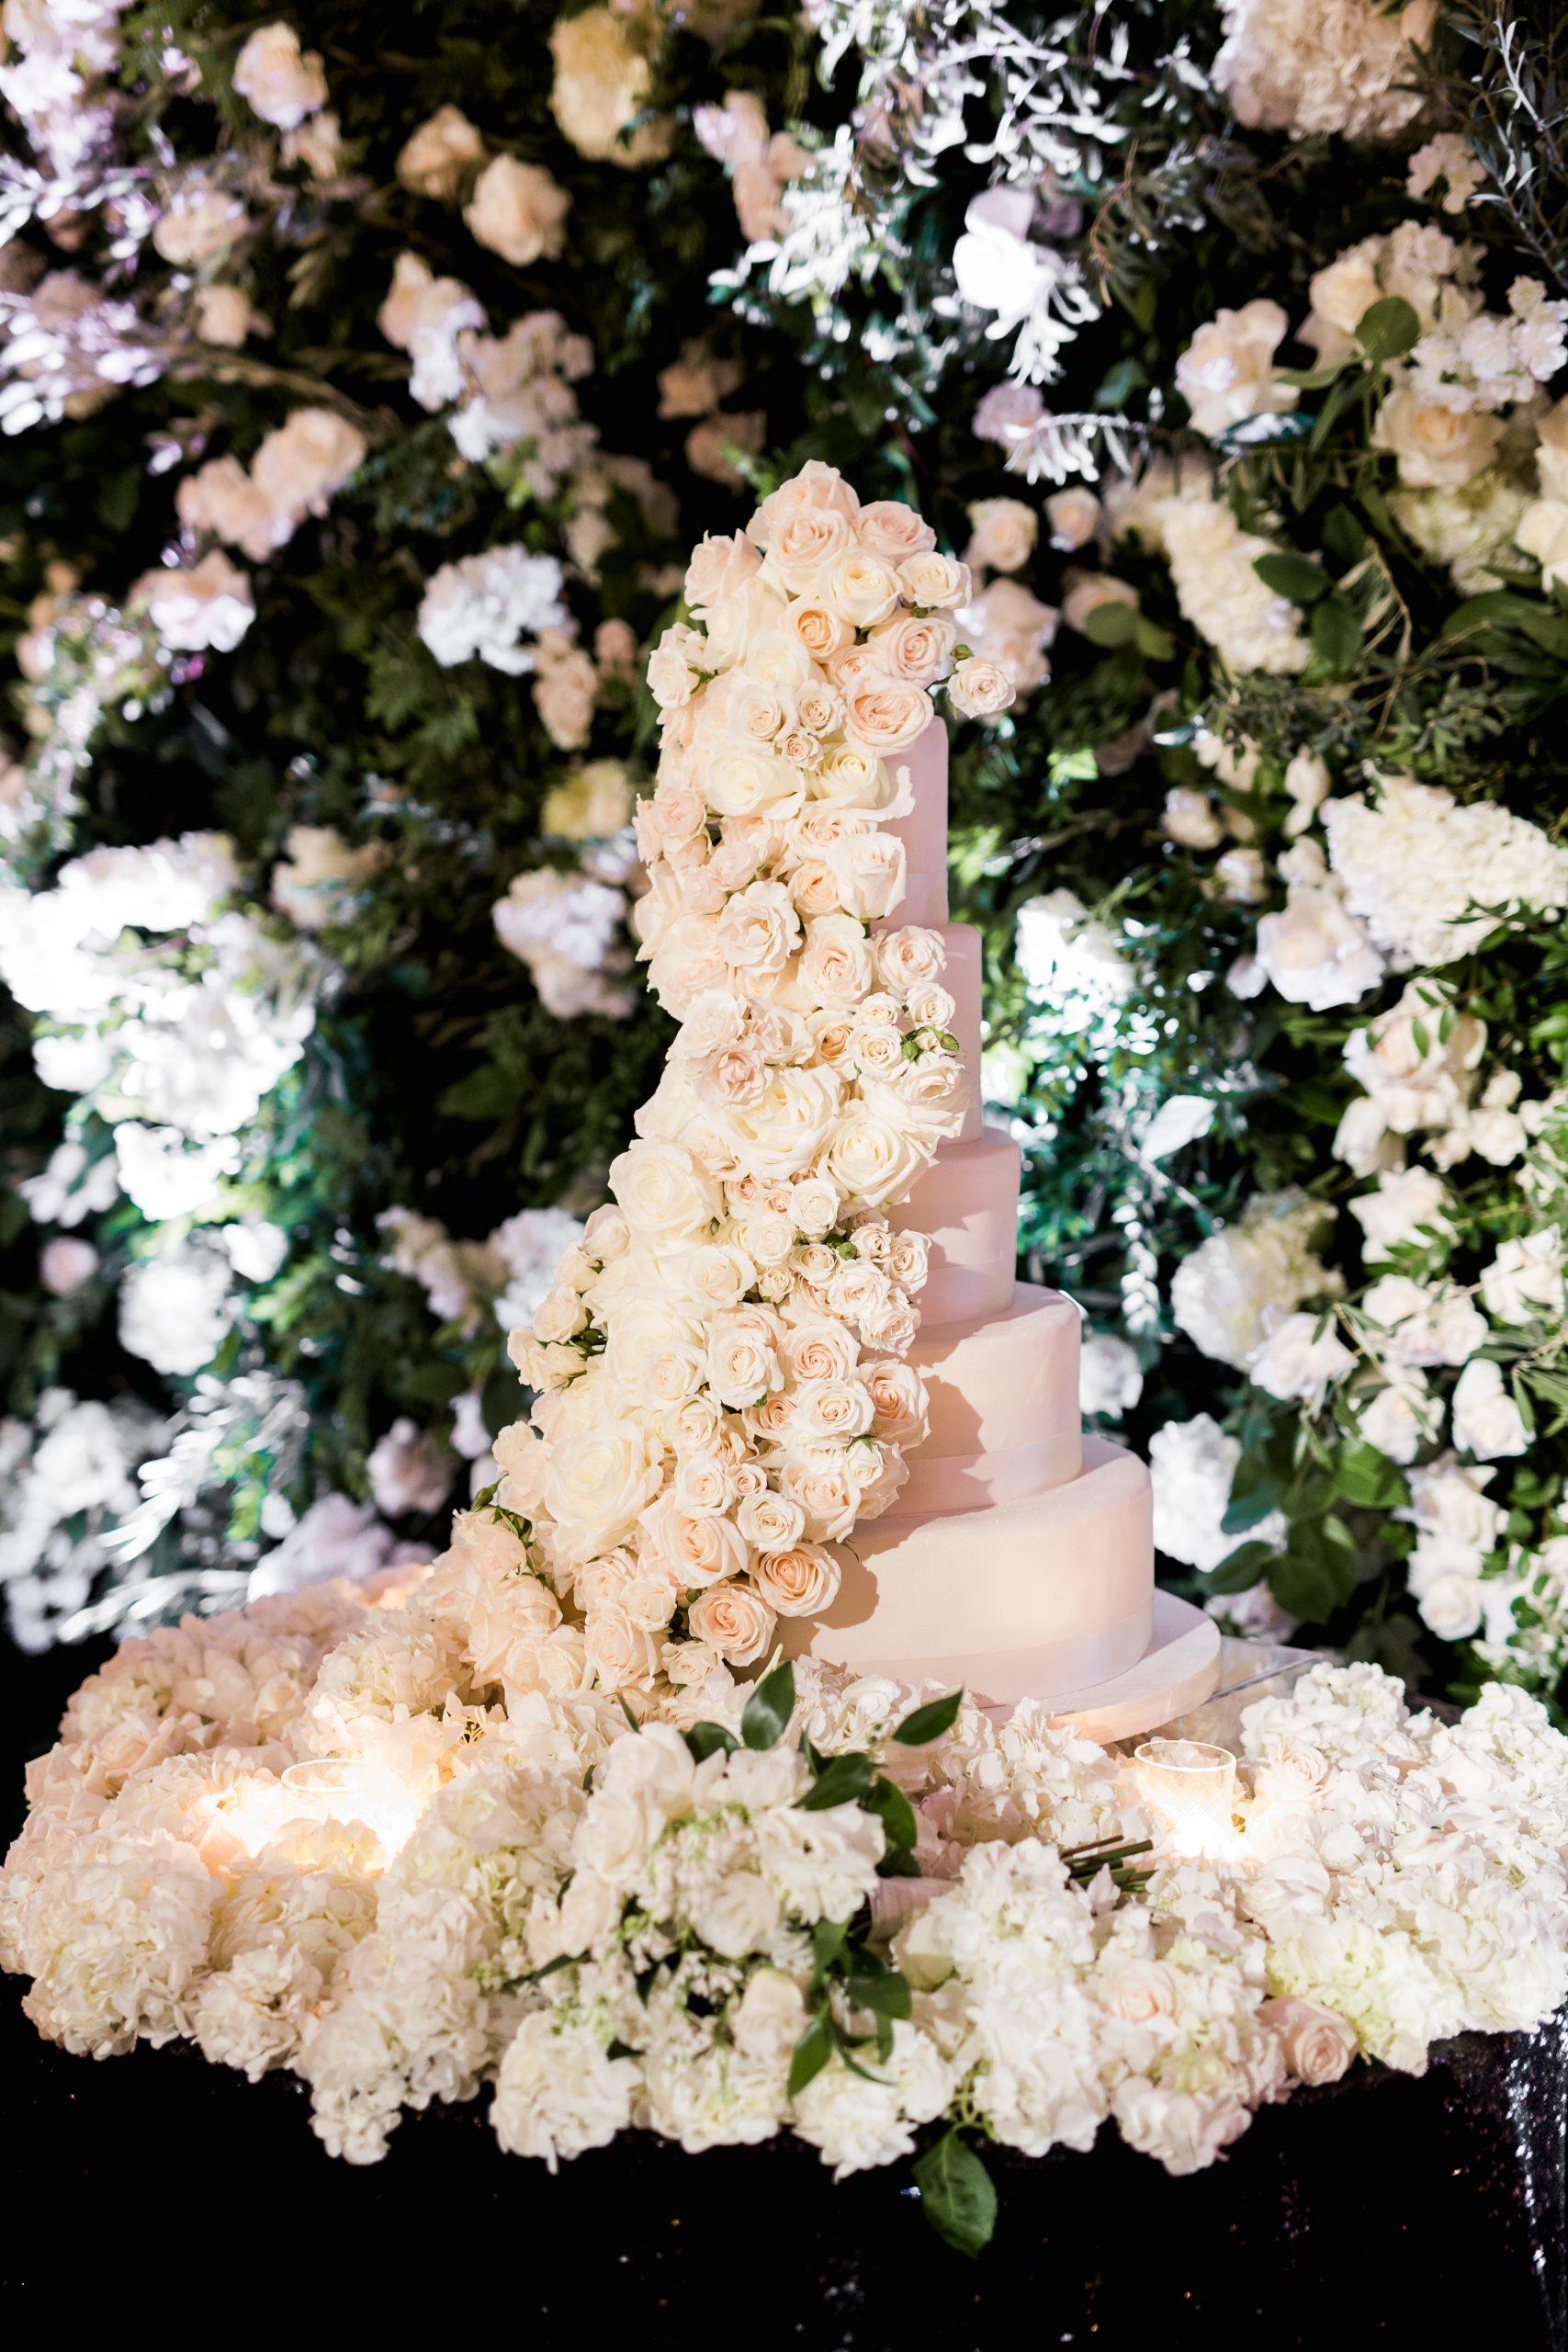 creative-wedding-cake-tables